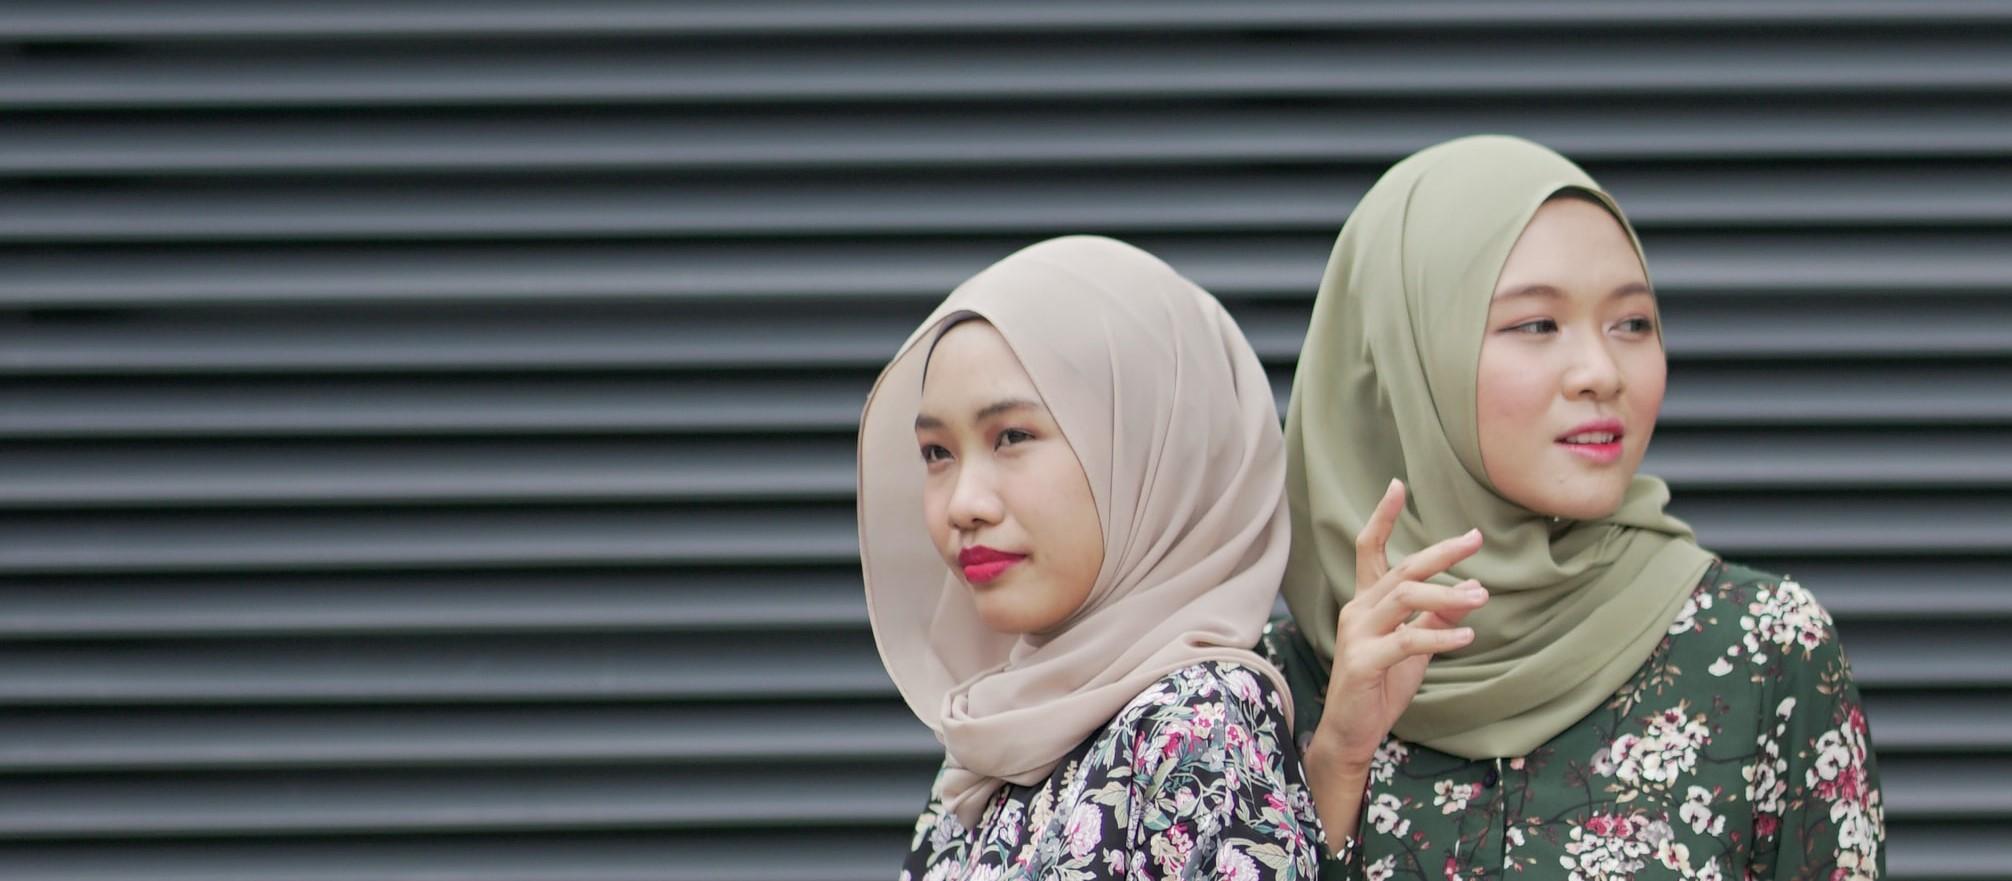 Asia Women rail curtain Green grey 2